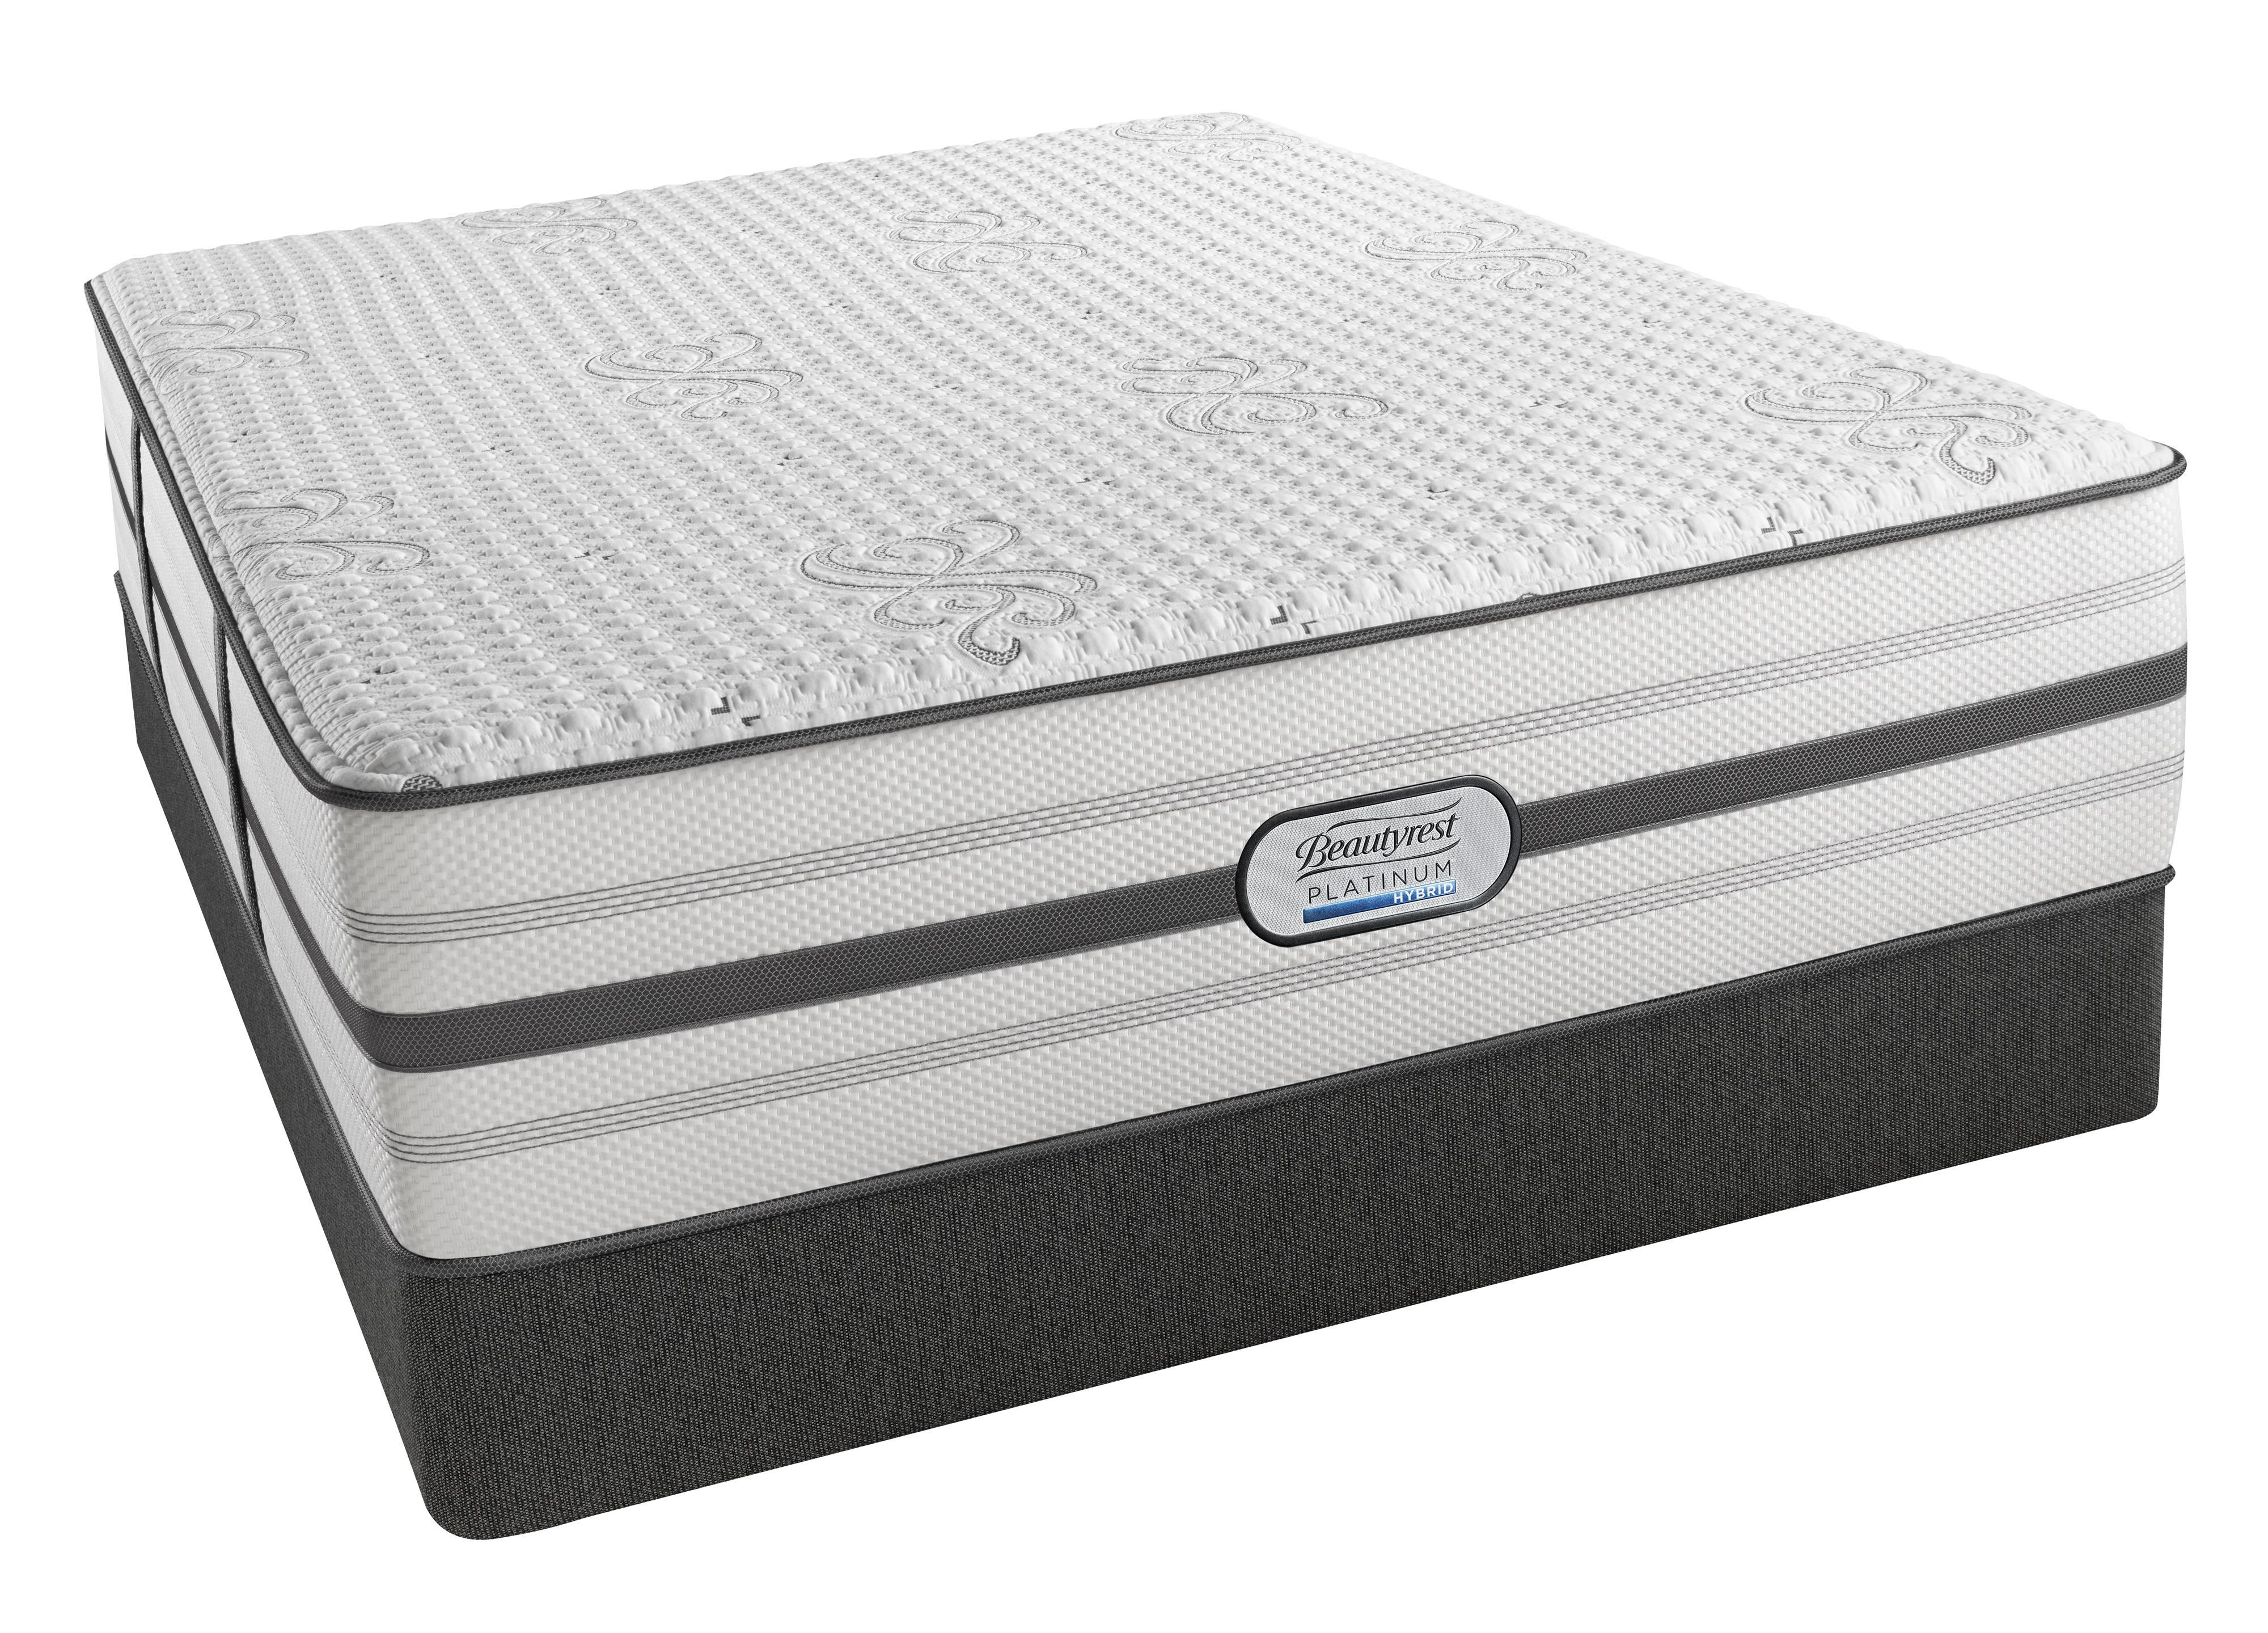 Beautyrest BR Platinum Hybrid Quinn Twin XL Ultra Plush Hybrid Mattress Set - Item Number: BRHLV4UPL-TXL+50280TXLK